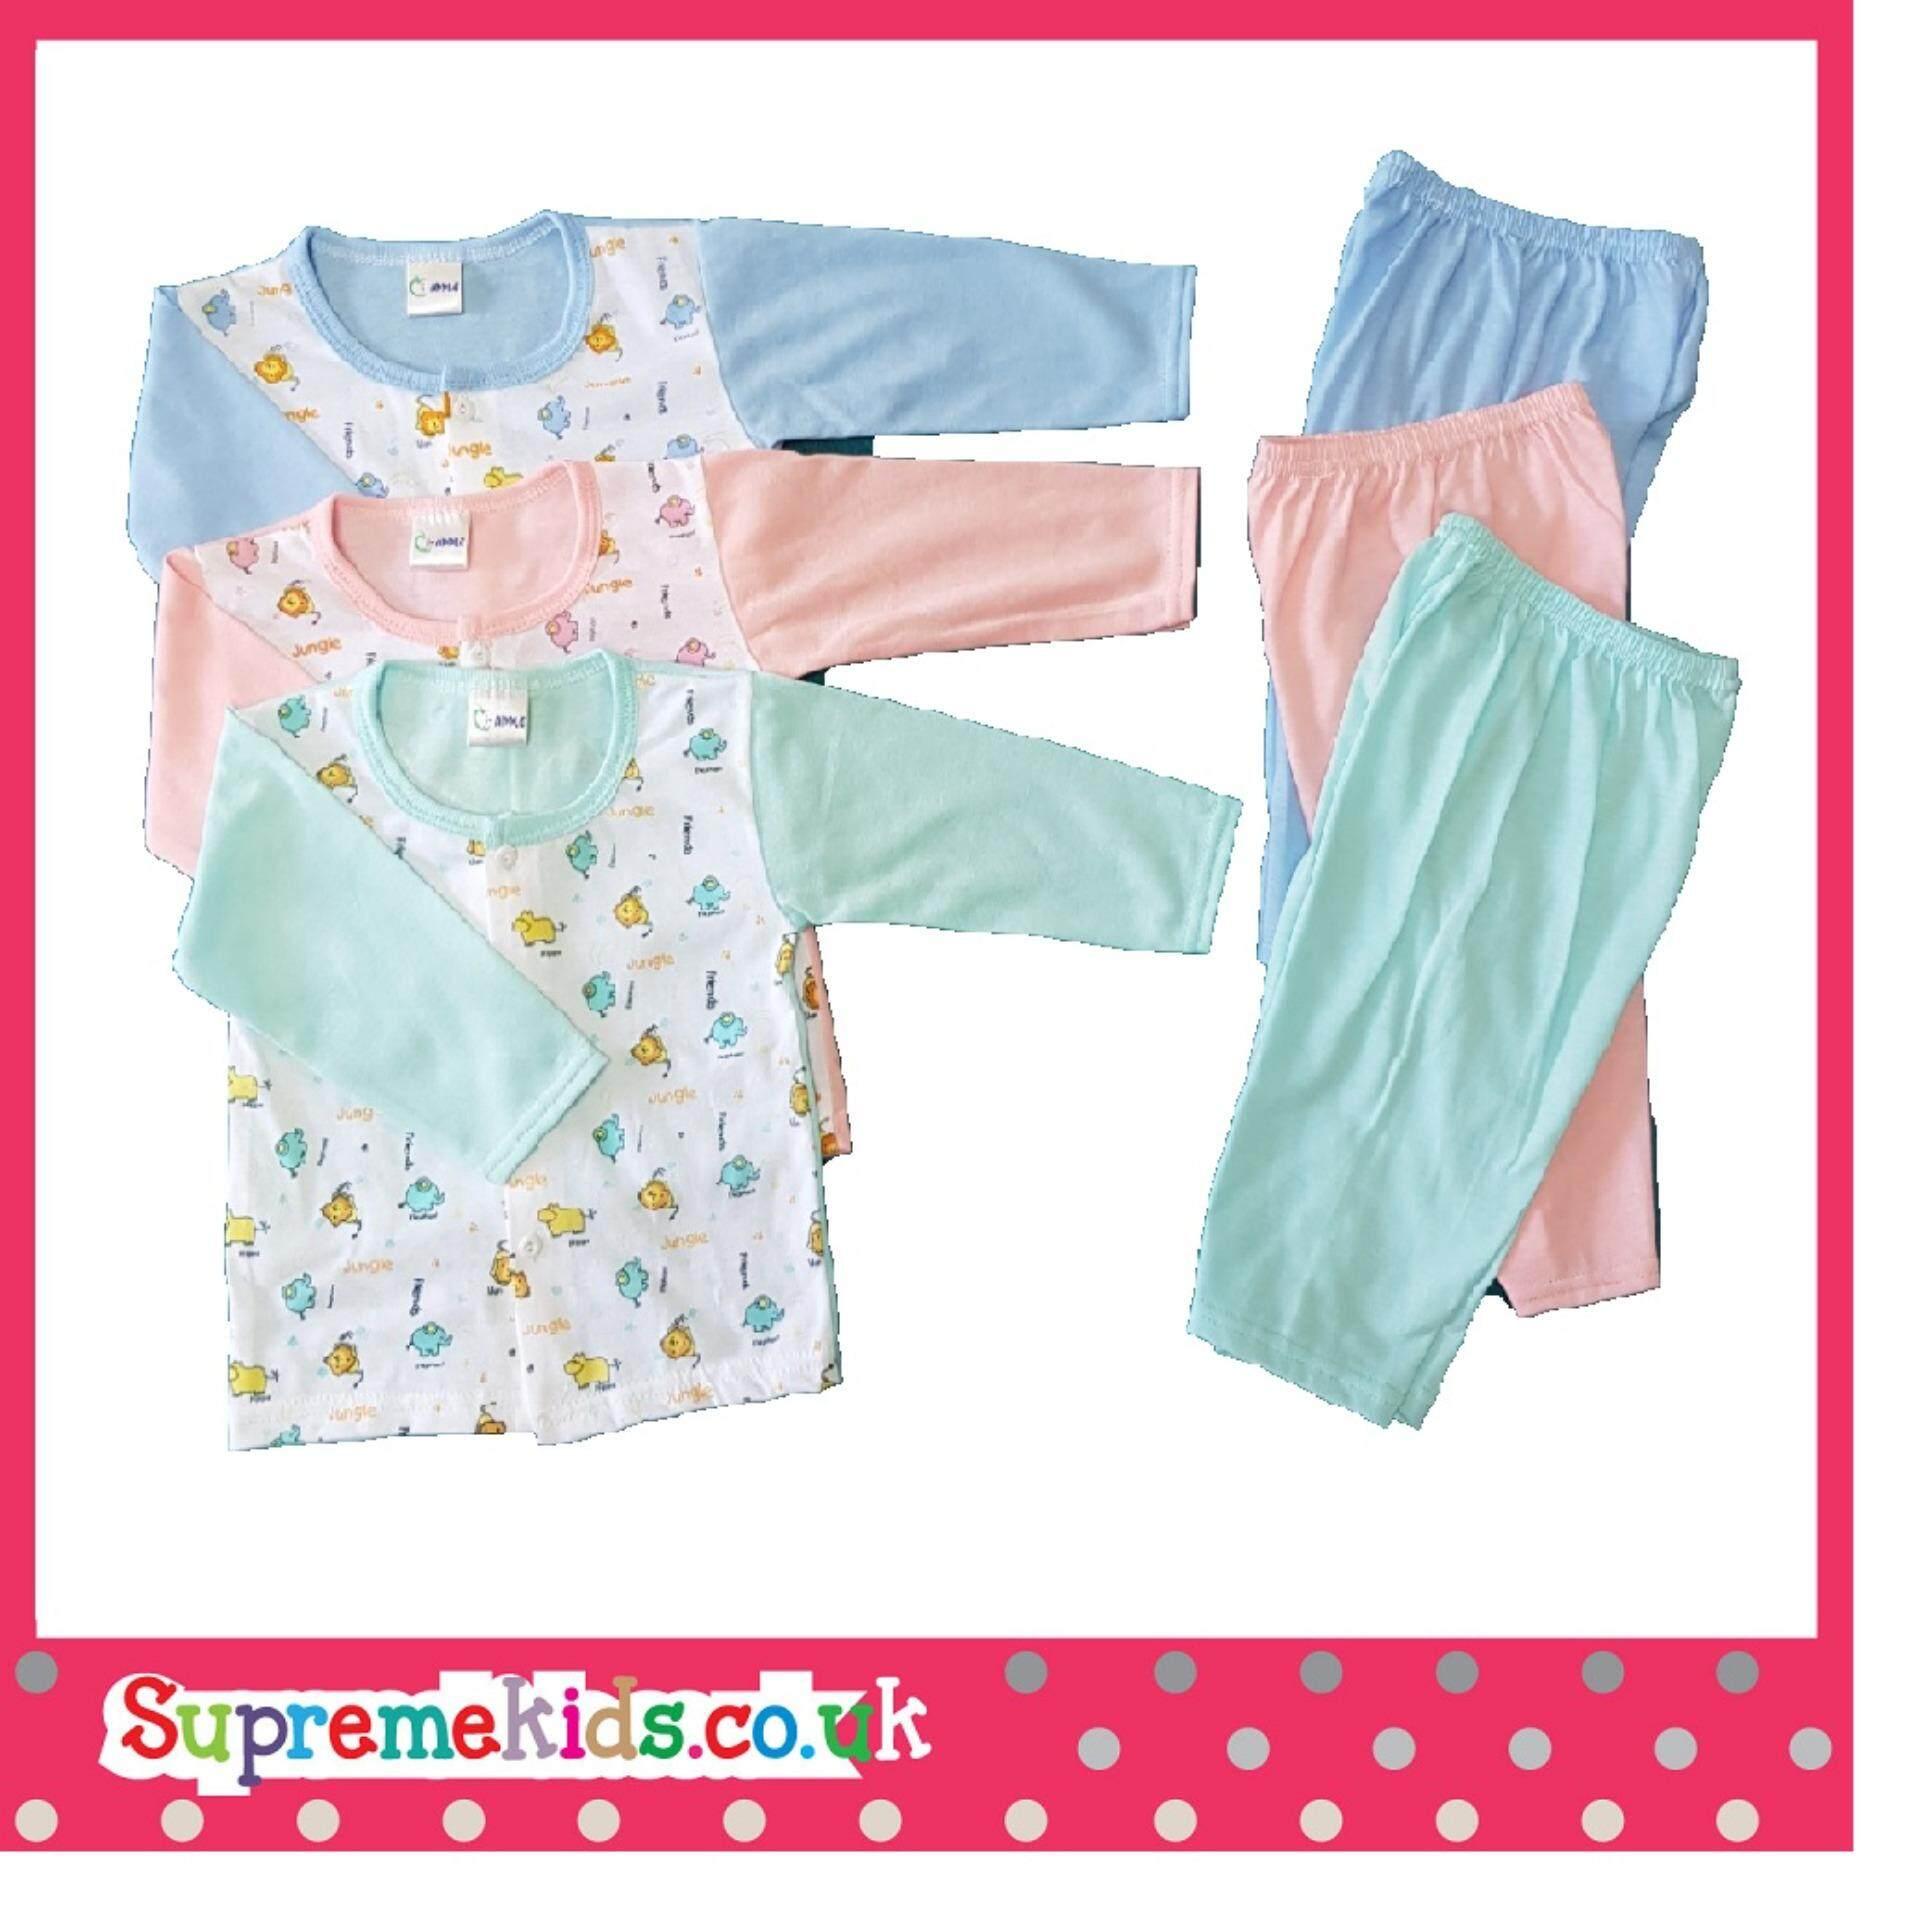 Newborn & Baby 3 SET Pajamas Bundle Sales (Fit to Age: 6-18Mth Mass:8-12kg Height:69-80CM)